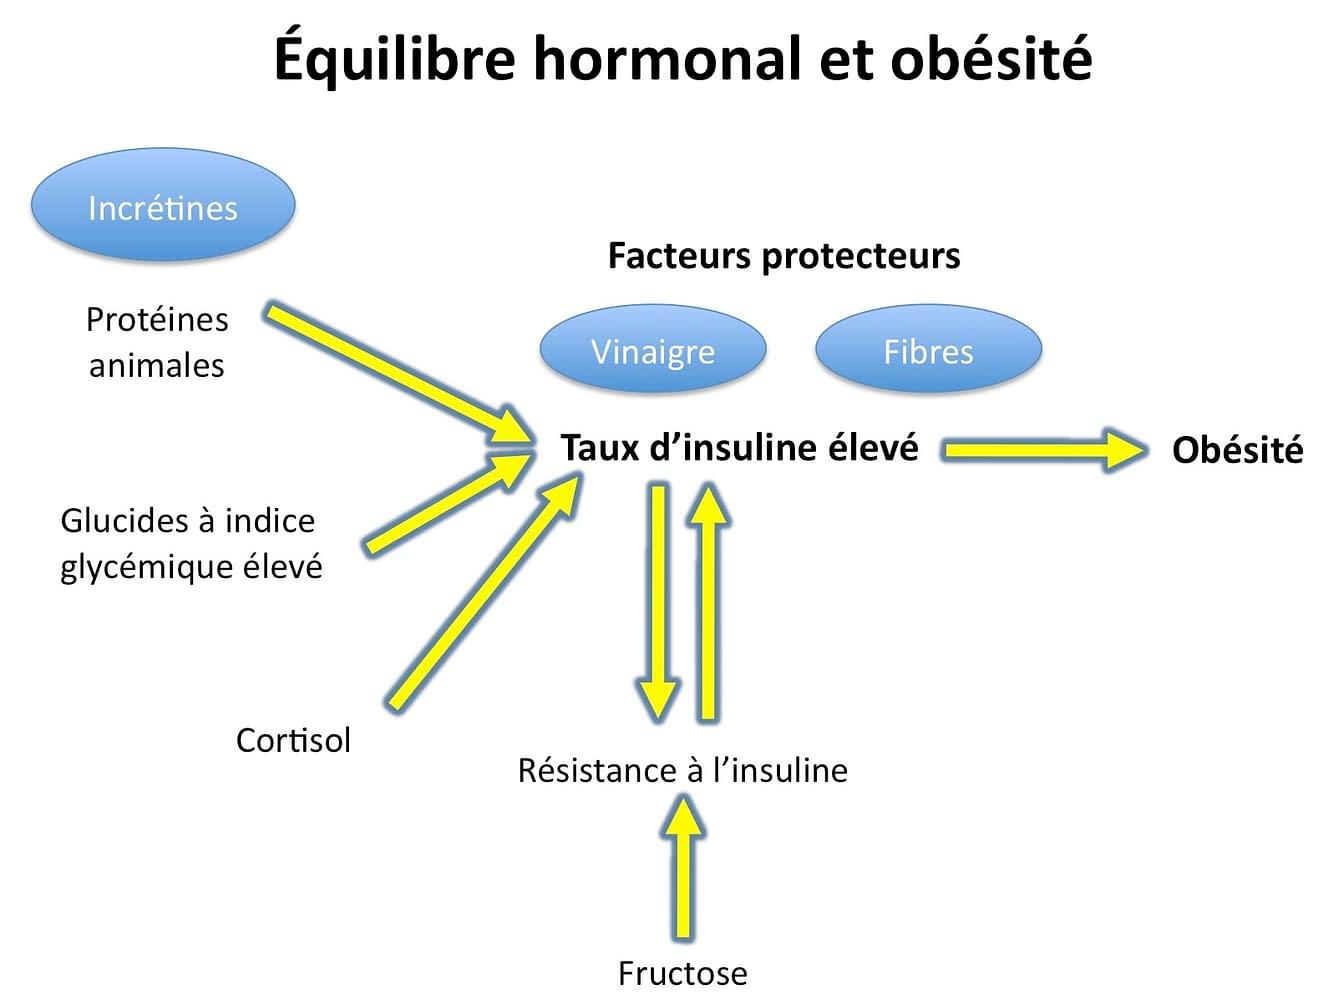 HormonalTheoryOfObesity-fr